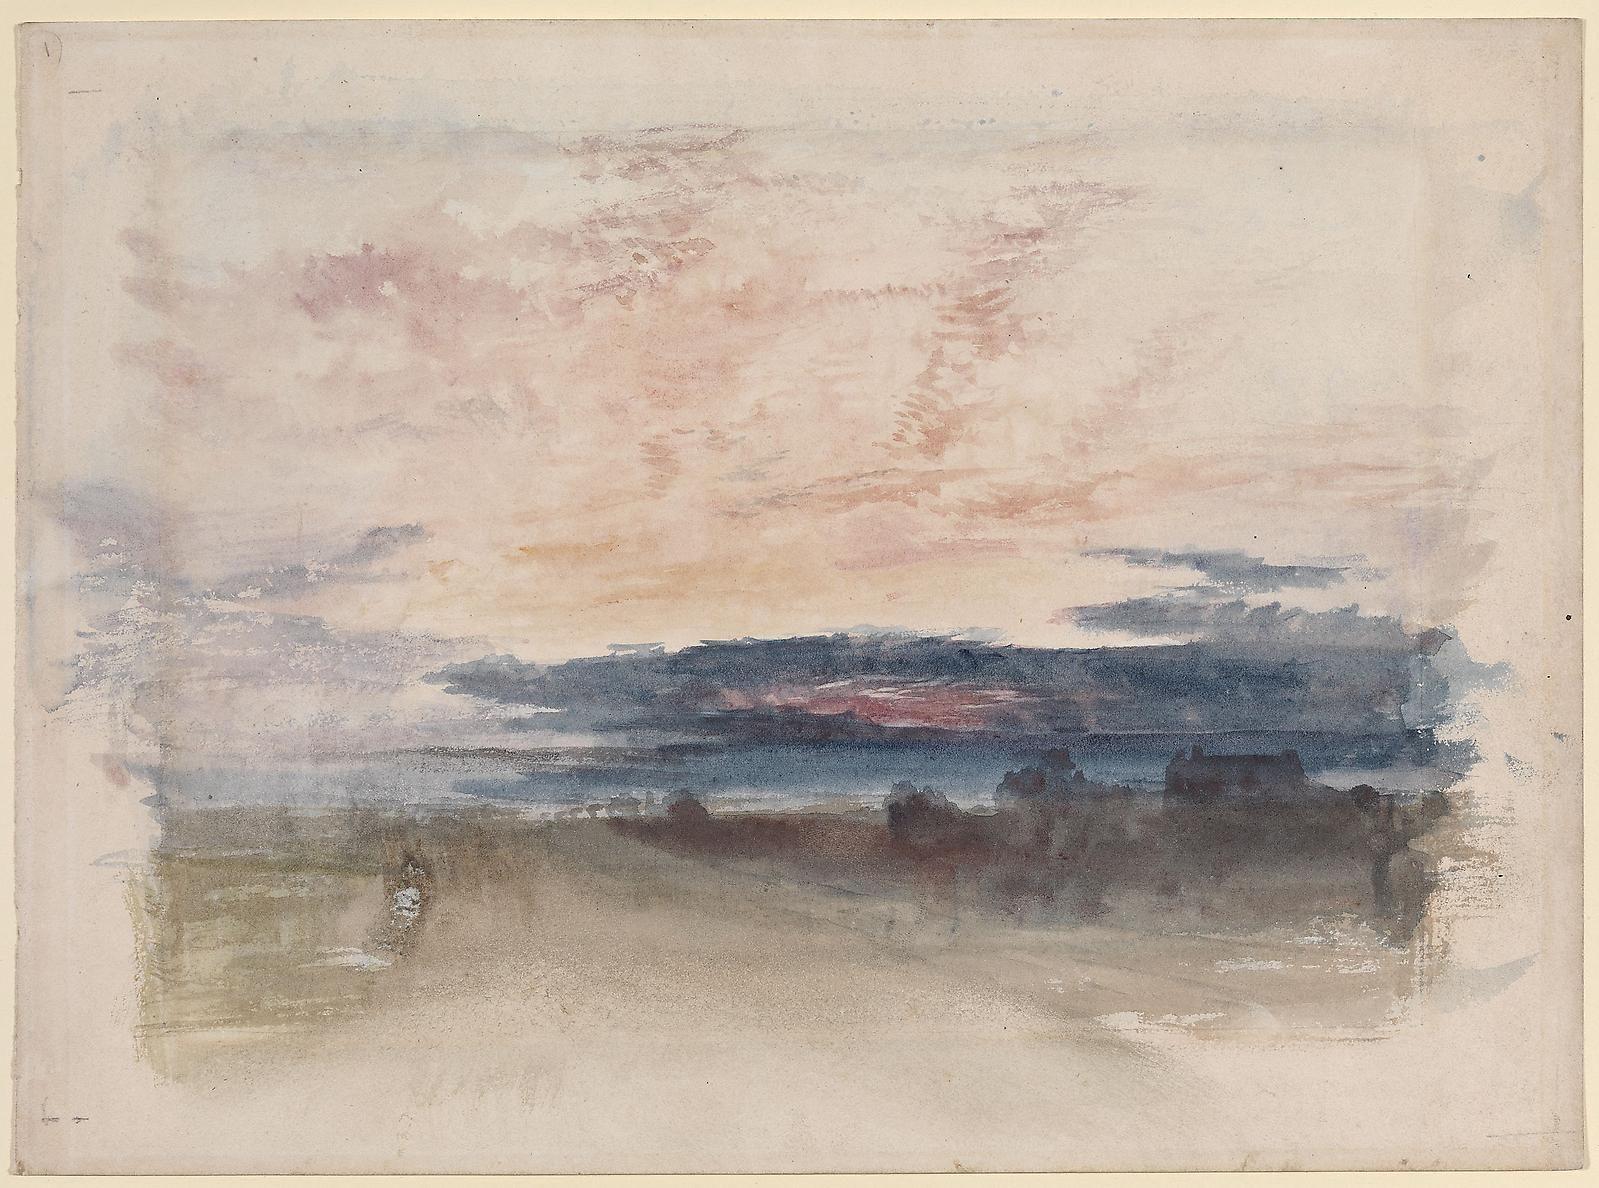 JOSEPH MALLORD WILLIAM TURNER RA (1775-1851)